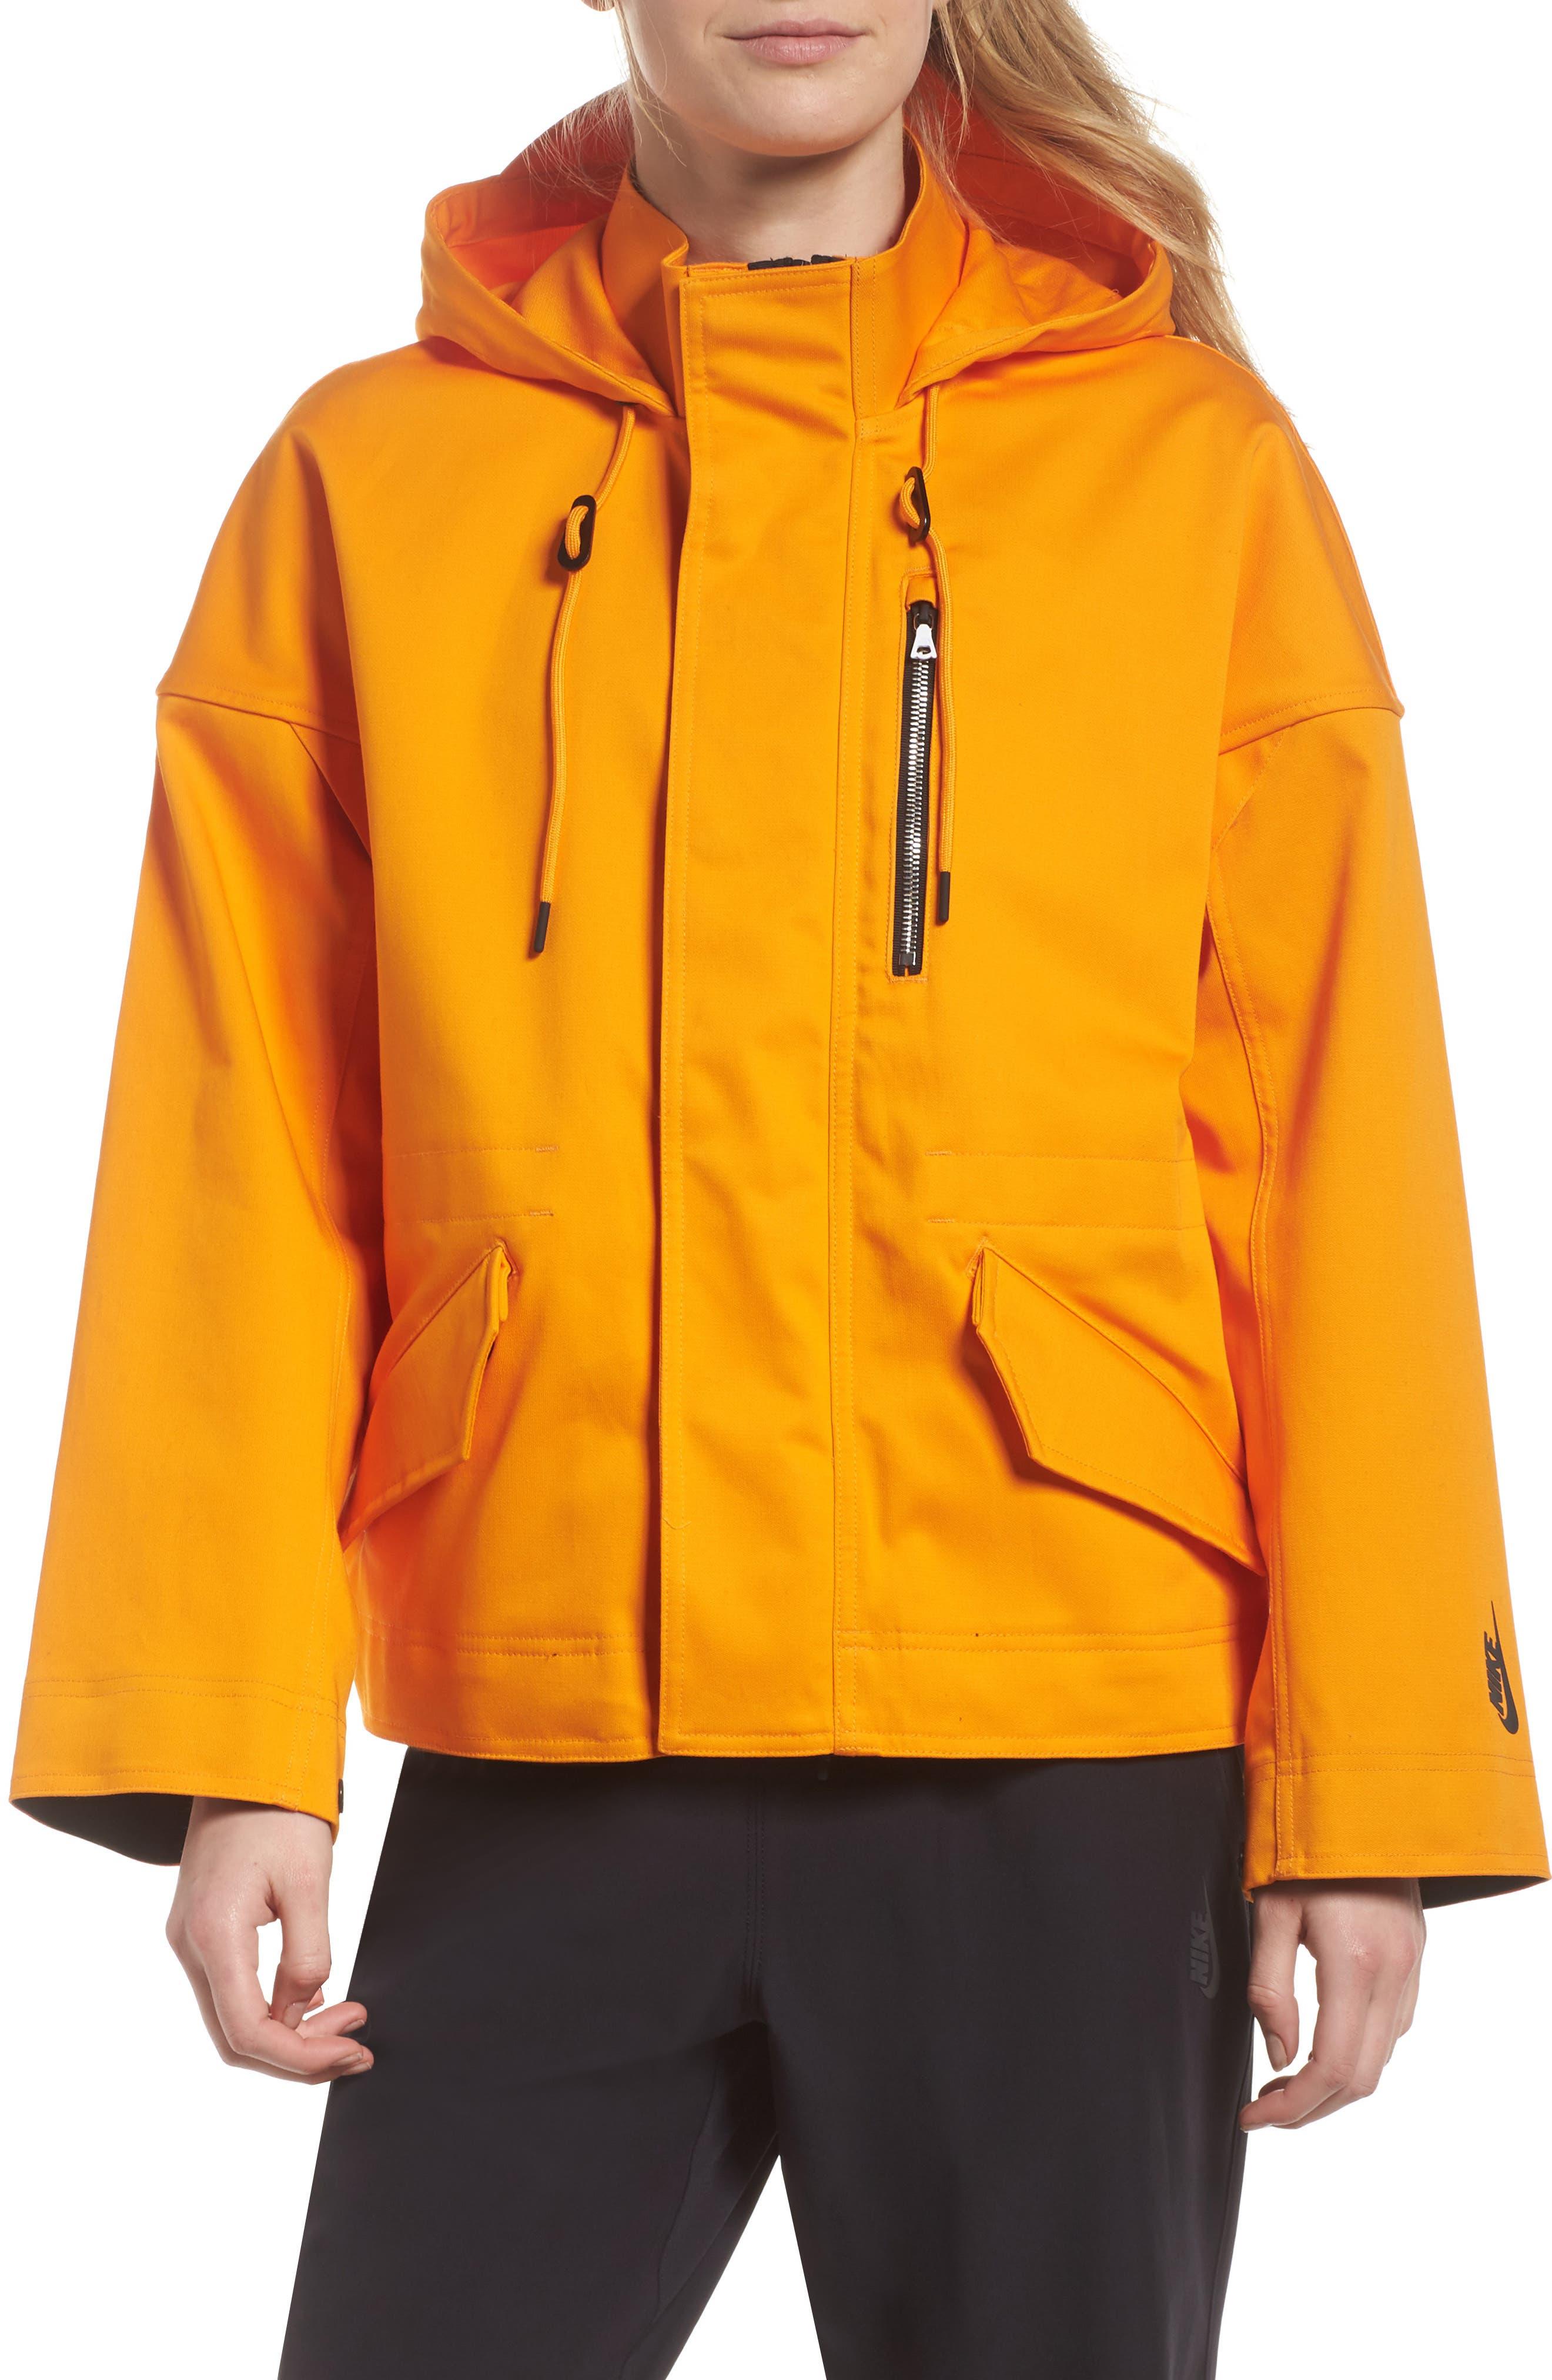 NikeLab Collection Women's Tactical Jacket,                             Main thumbnail 2, color,